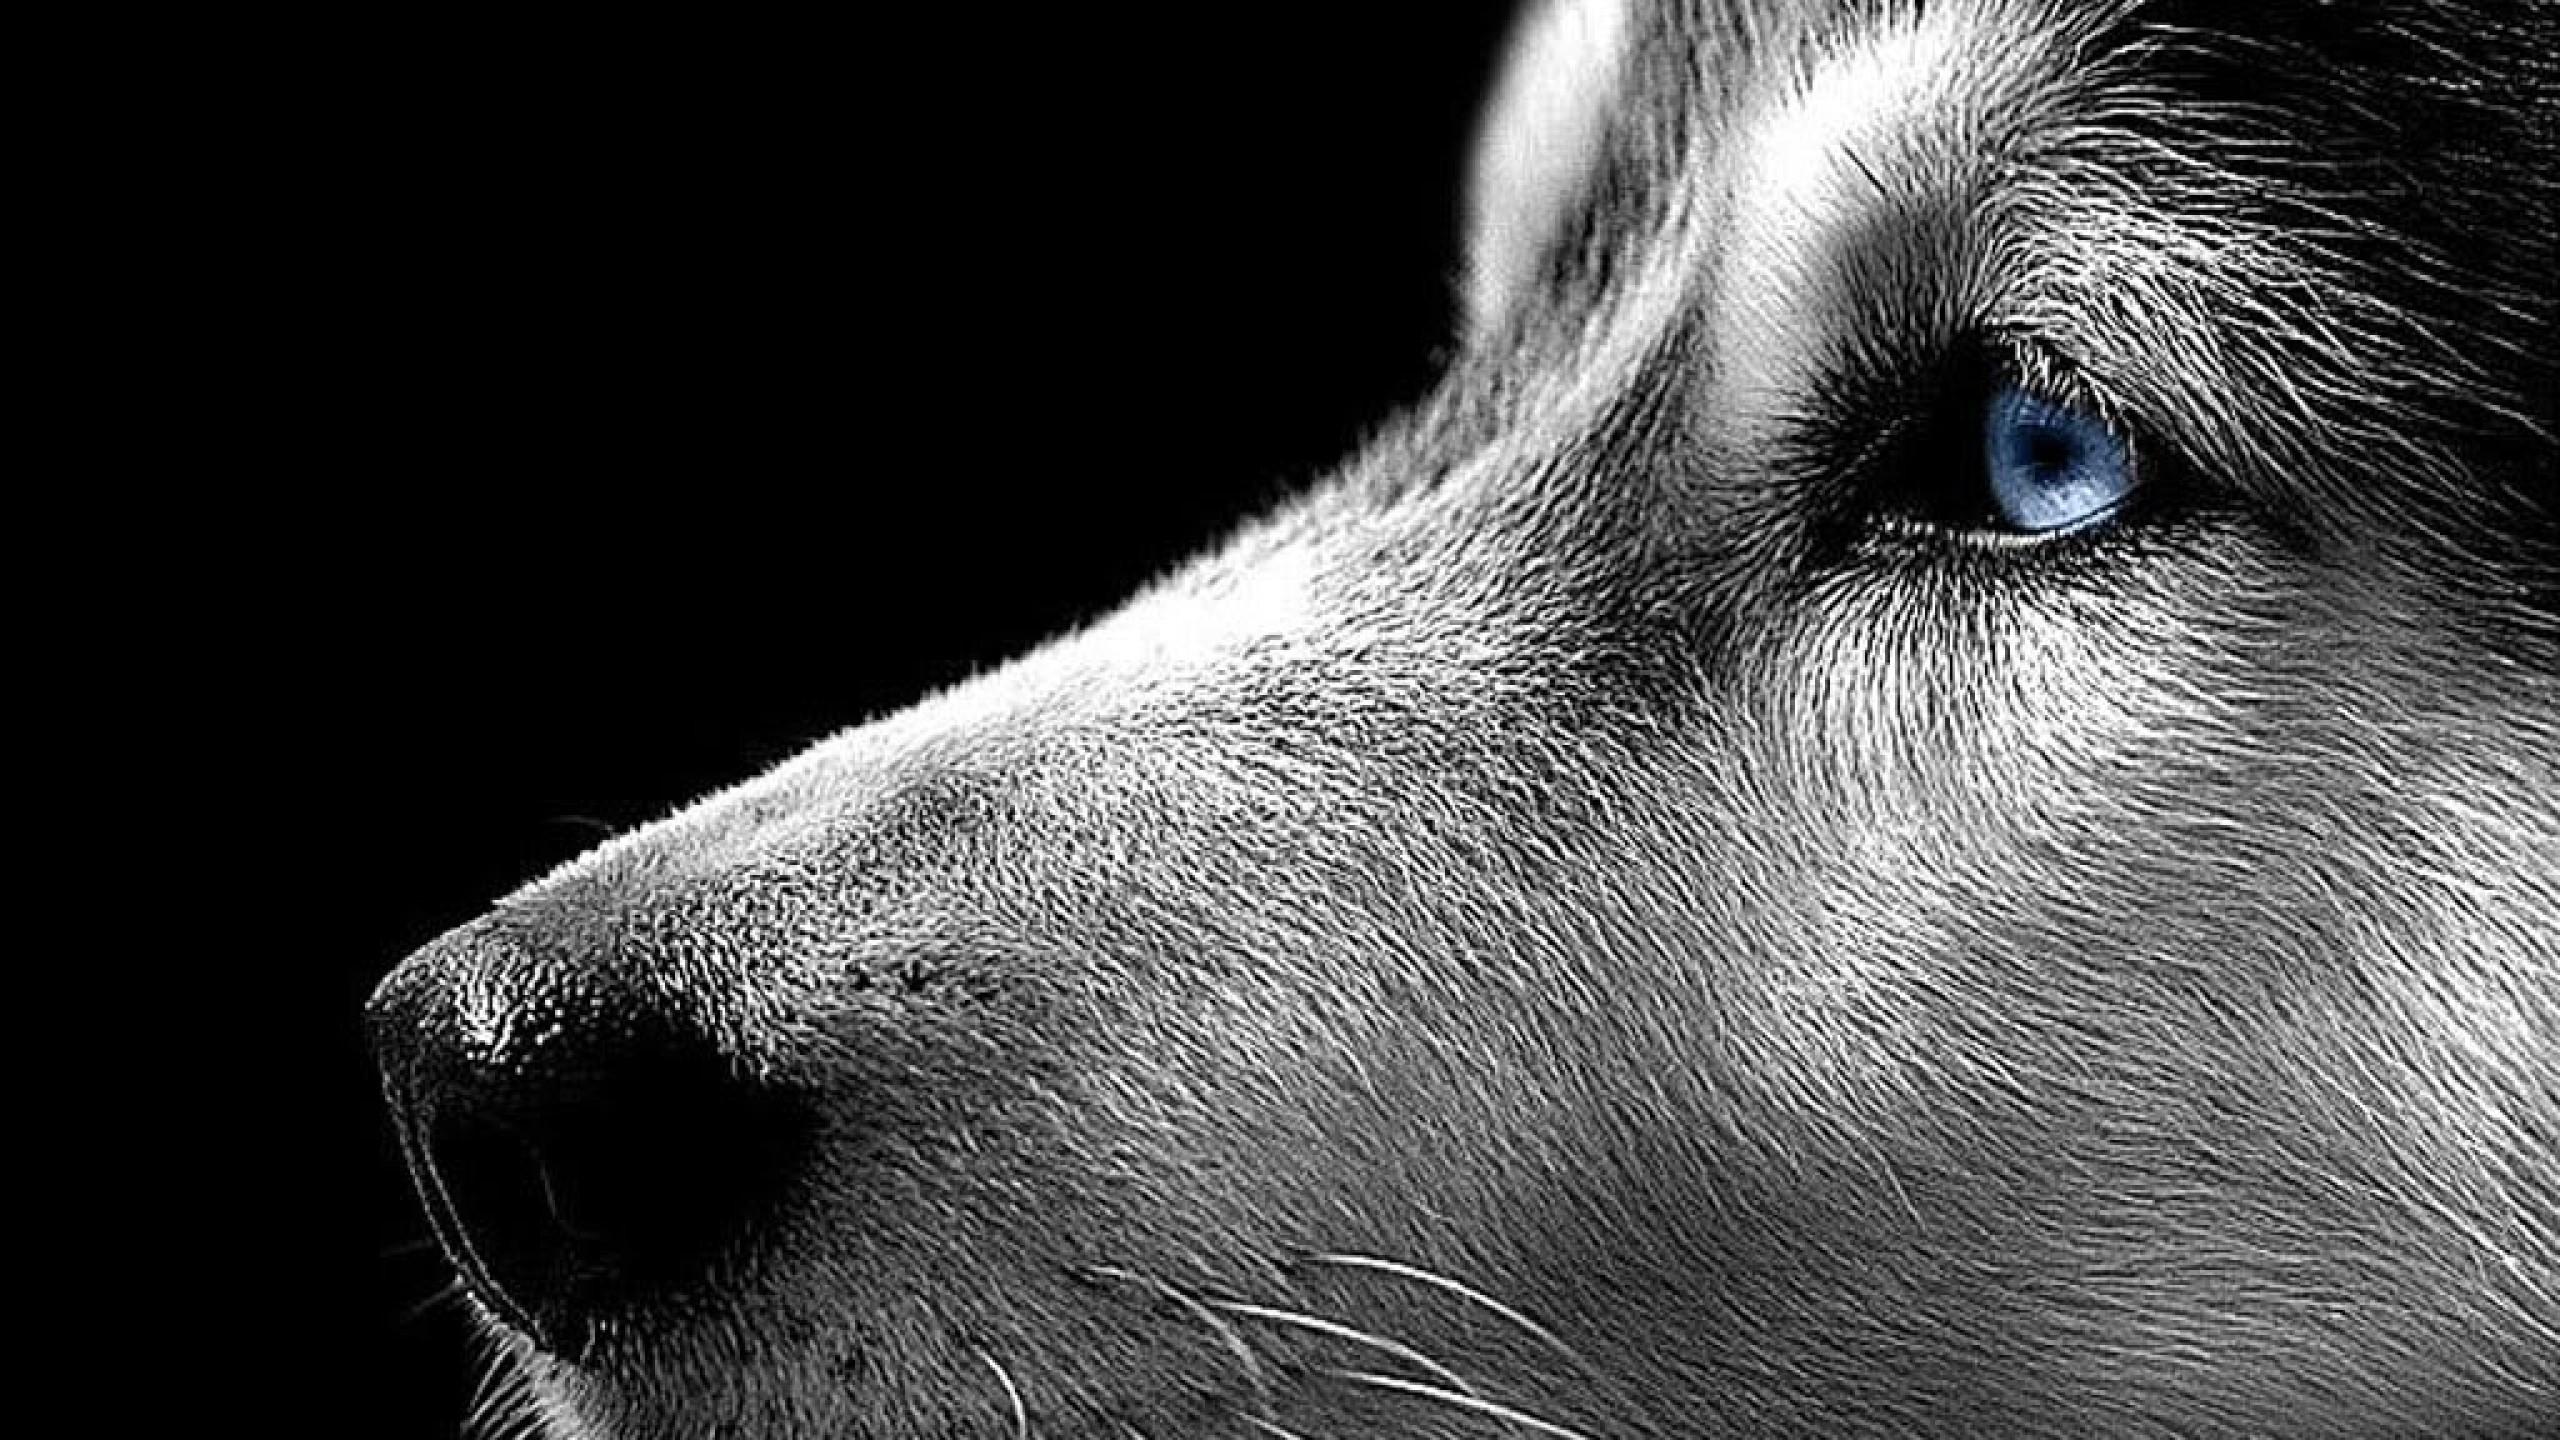 wallpaper details file name siberian husky wallpaper free download .